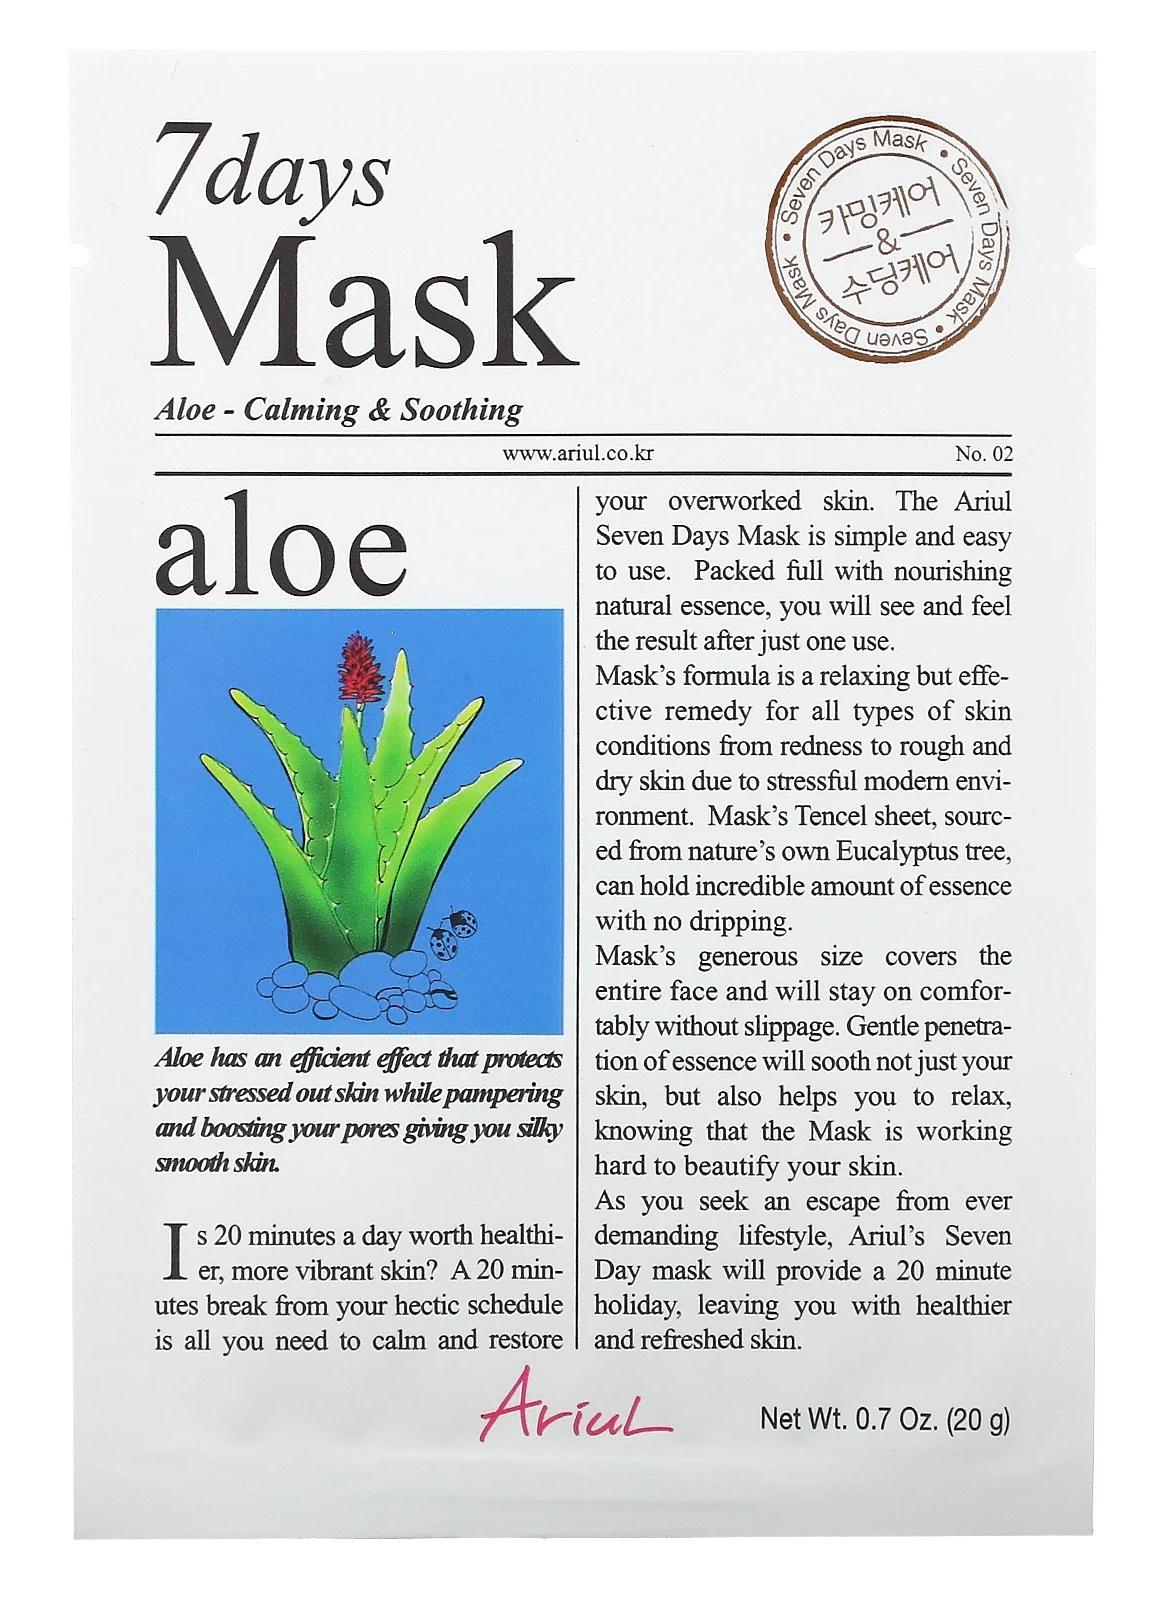 Ariul 7 Days Mask Aloe Calming & Soothing